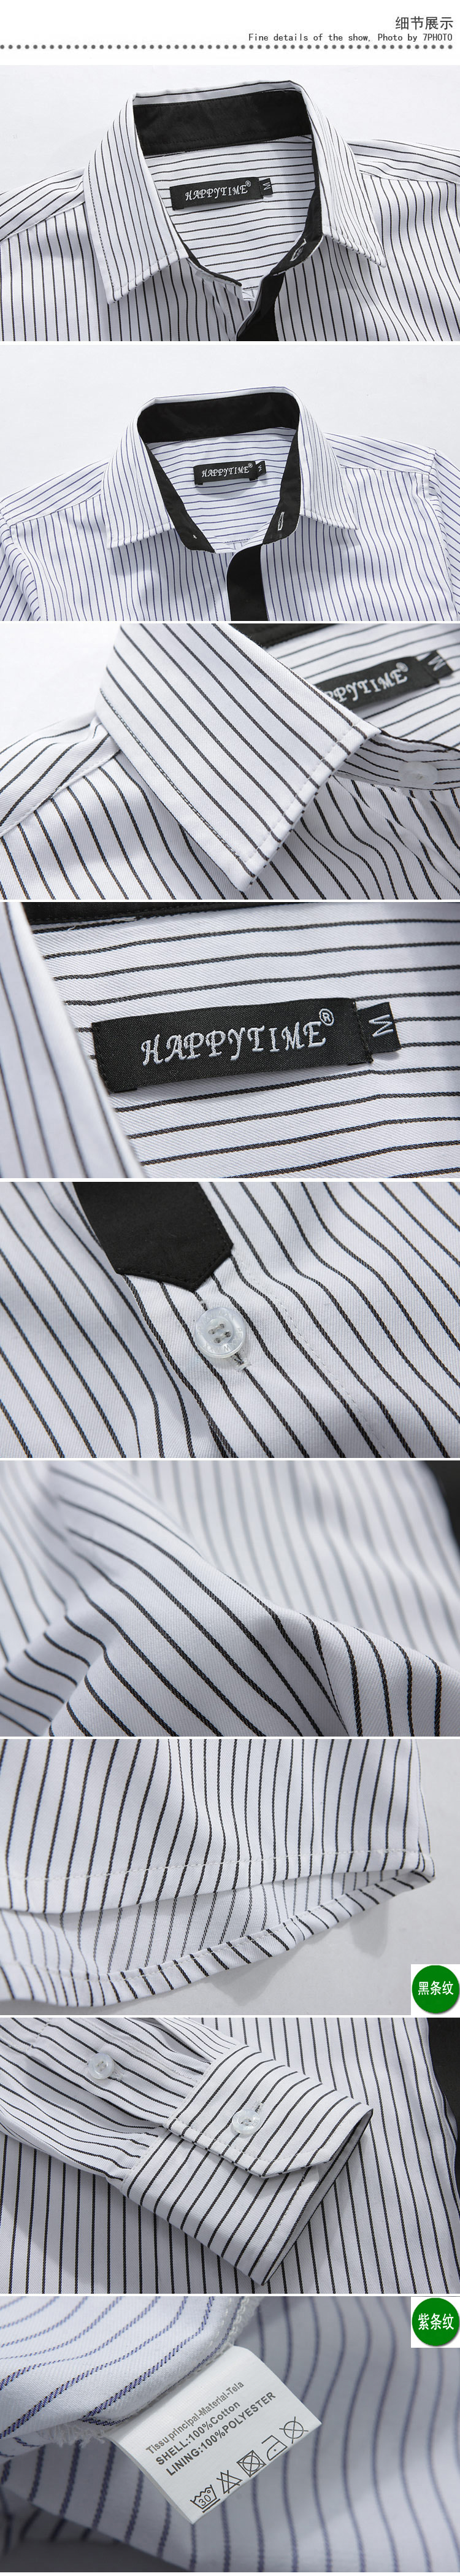 YW Man shirt men long sleeves Korean version of slim stripes men s long sleeve shirt spring spring tide brand pure cotton leisure shirts